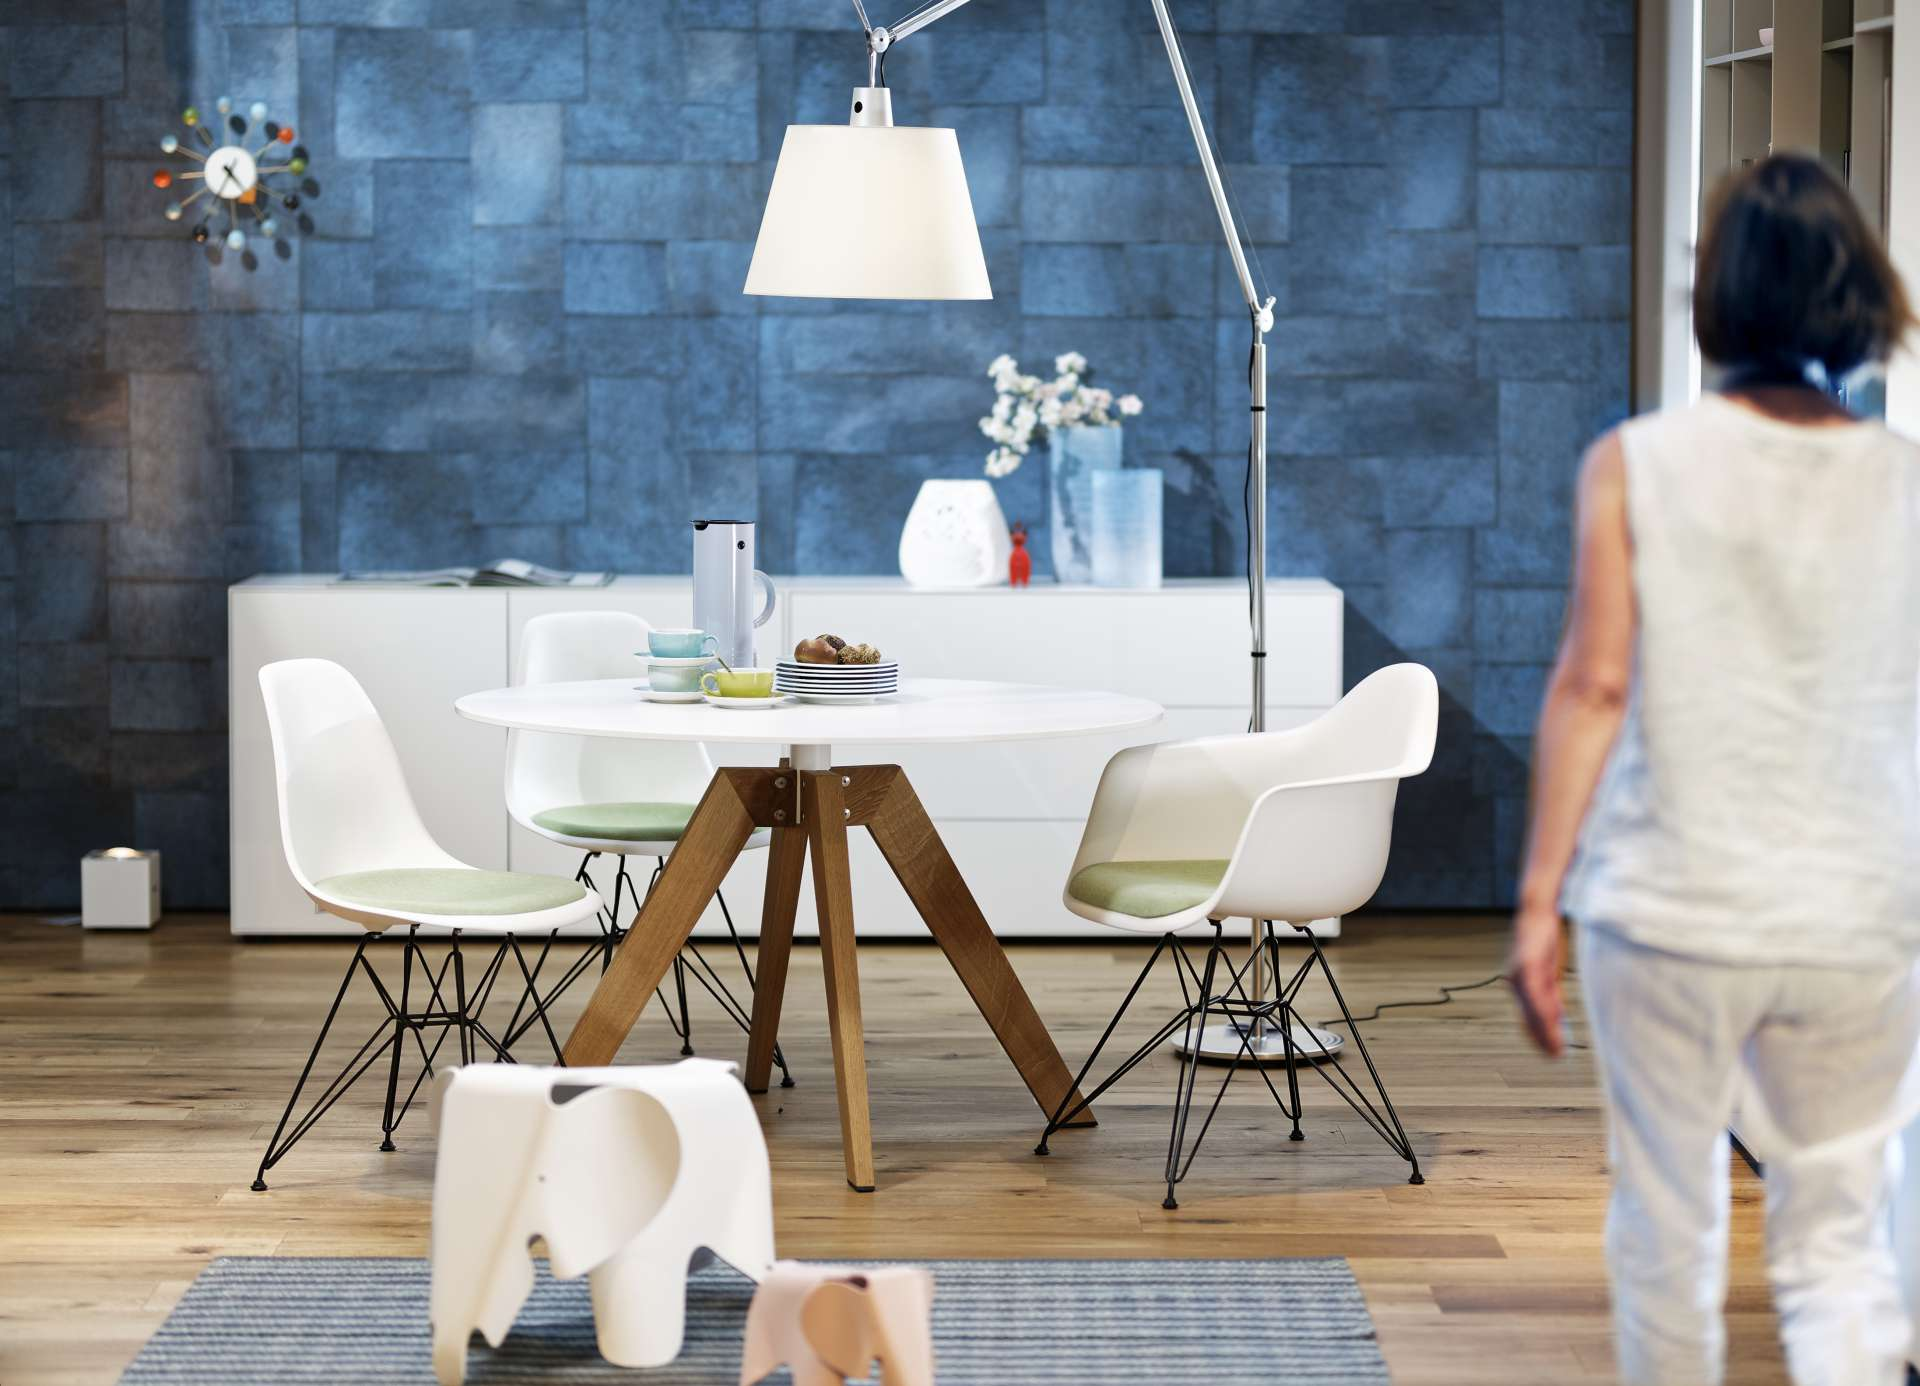 Lukaszewitz Laisen_2018_08_Essen_Sideboard Piure nex pur_Tisch asco Centro_Stuhl vitra eames chair